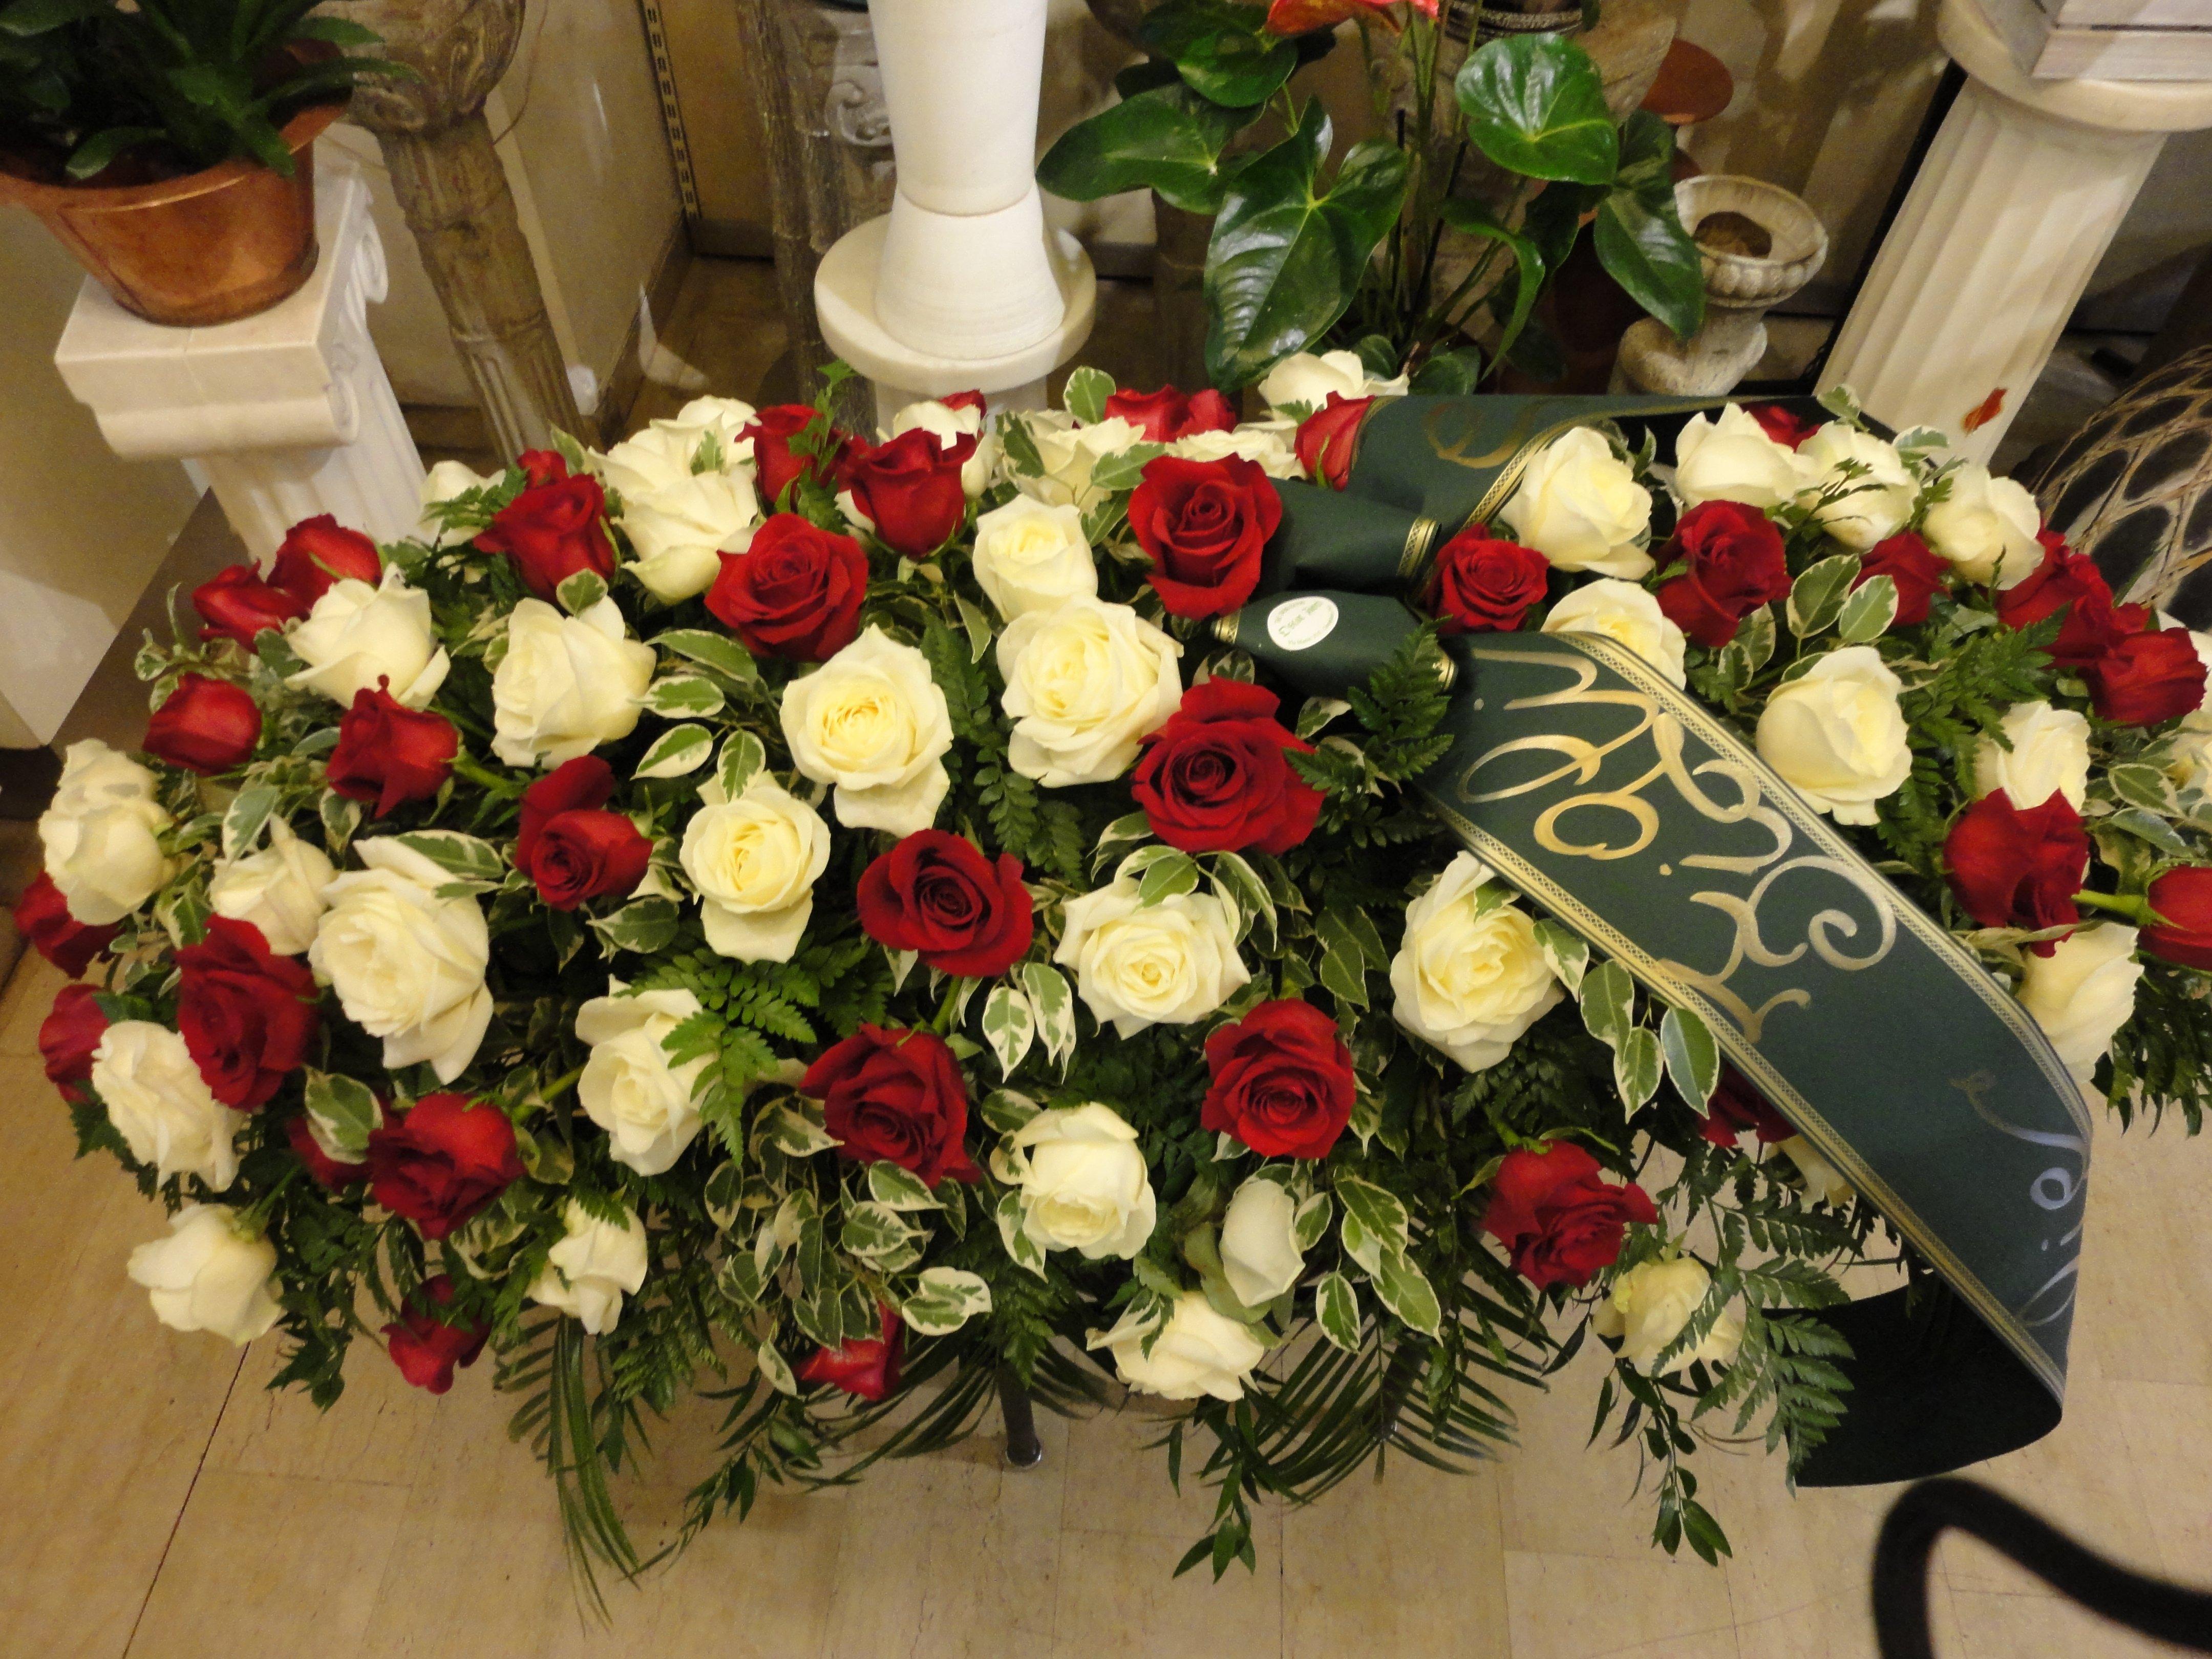 copricassa rose bianche e rosse